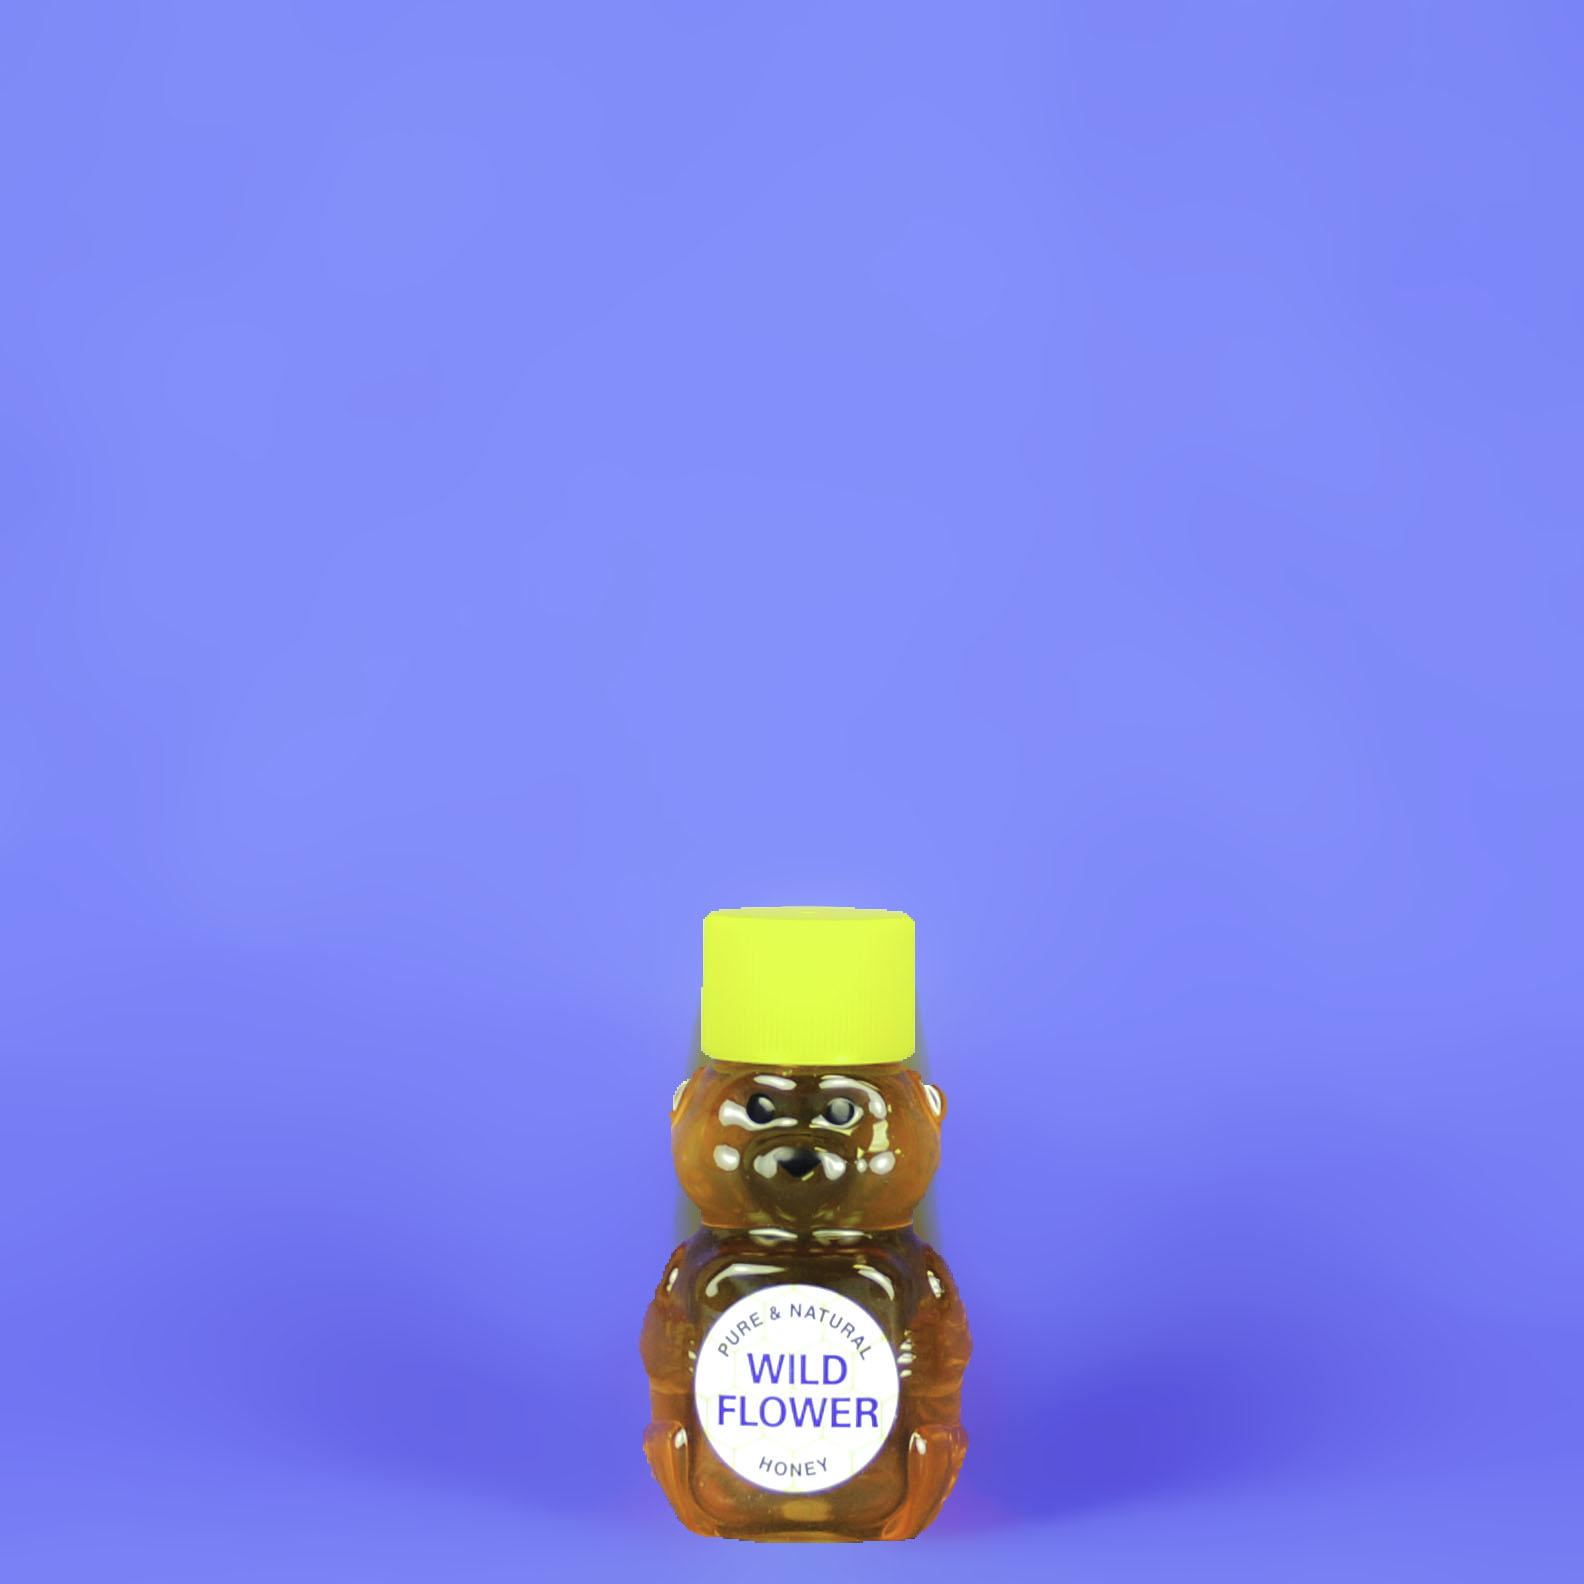 Wildflower Honey 2 oz Bear Bottle